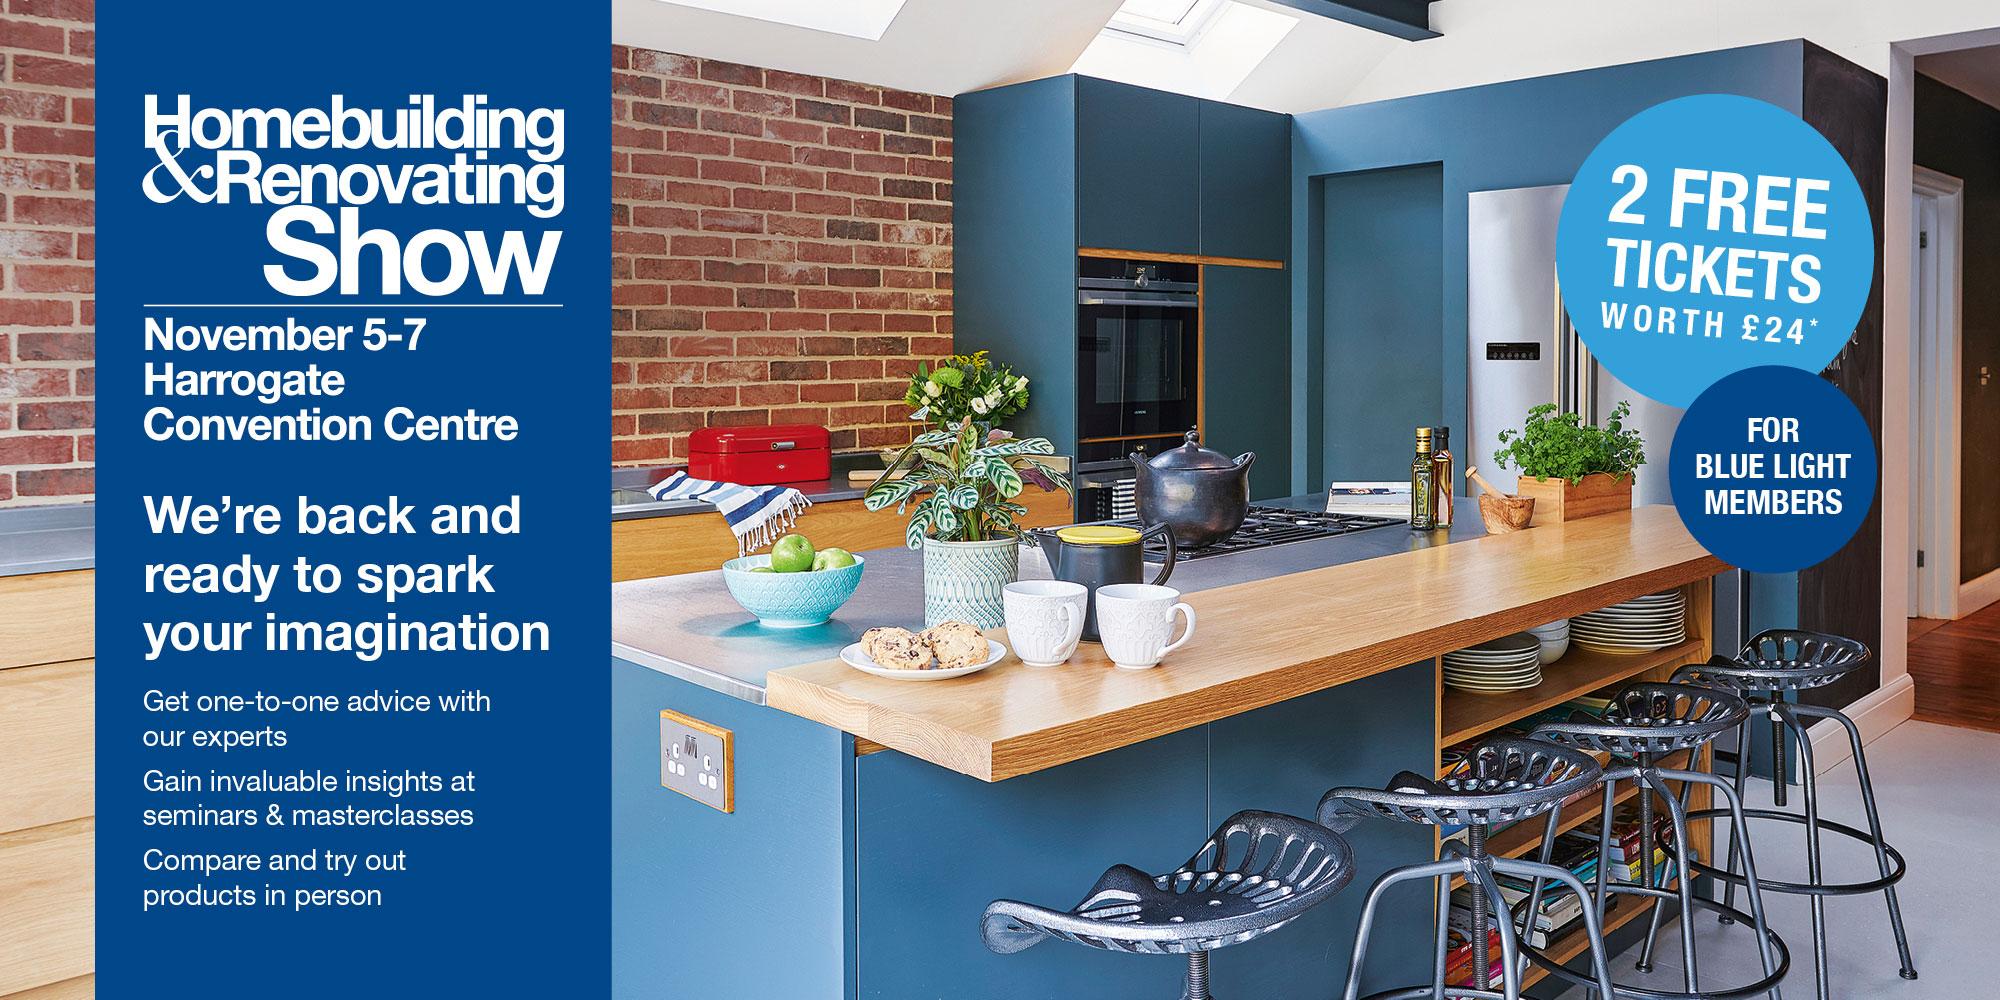 Homebuilding & Renovating Show - North